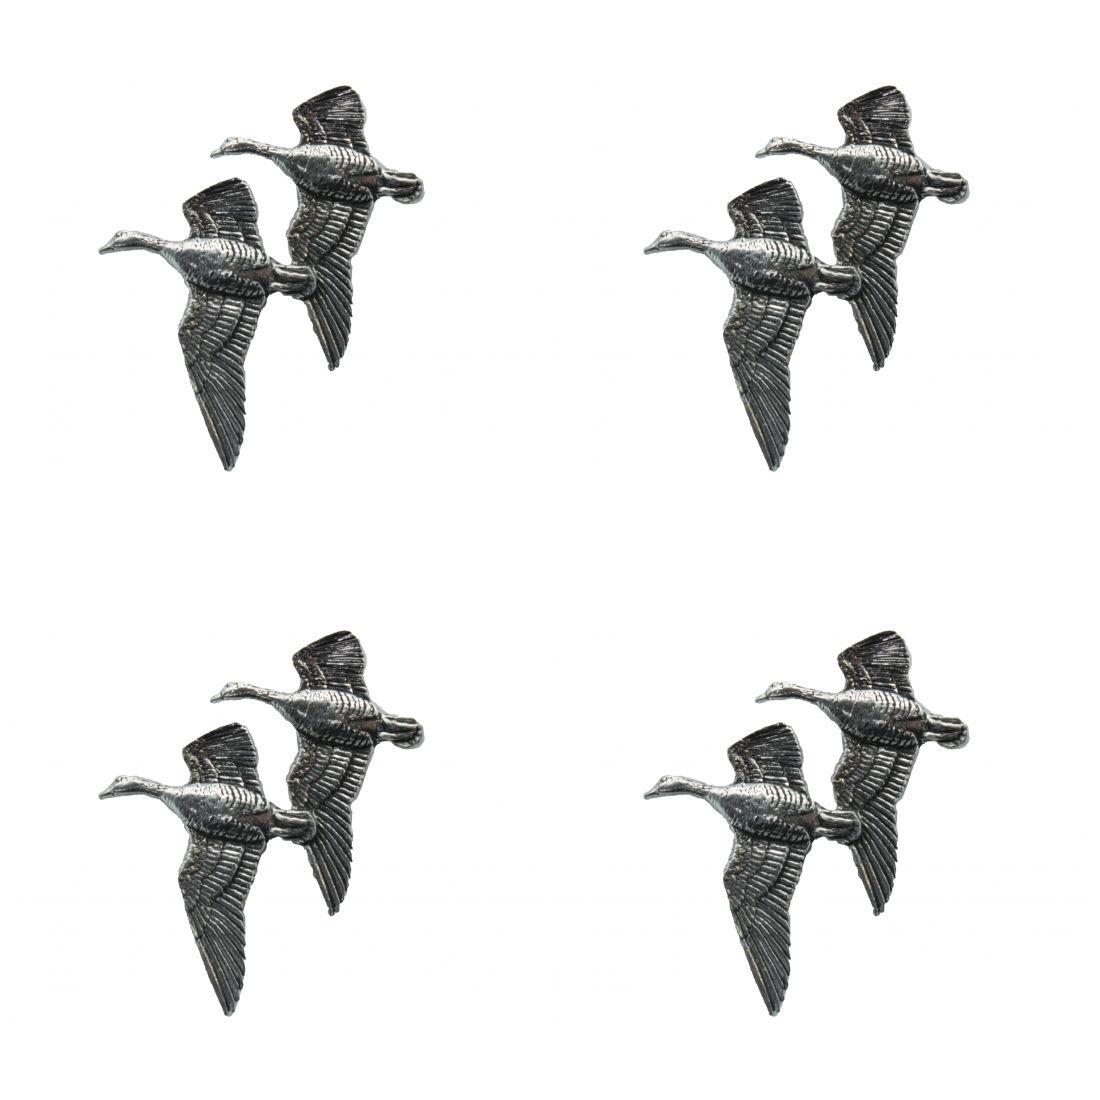 4 x Pin Anstecker Badge Gänse fliegend